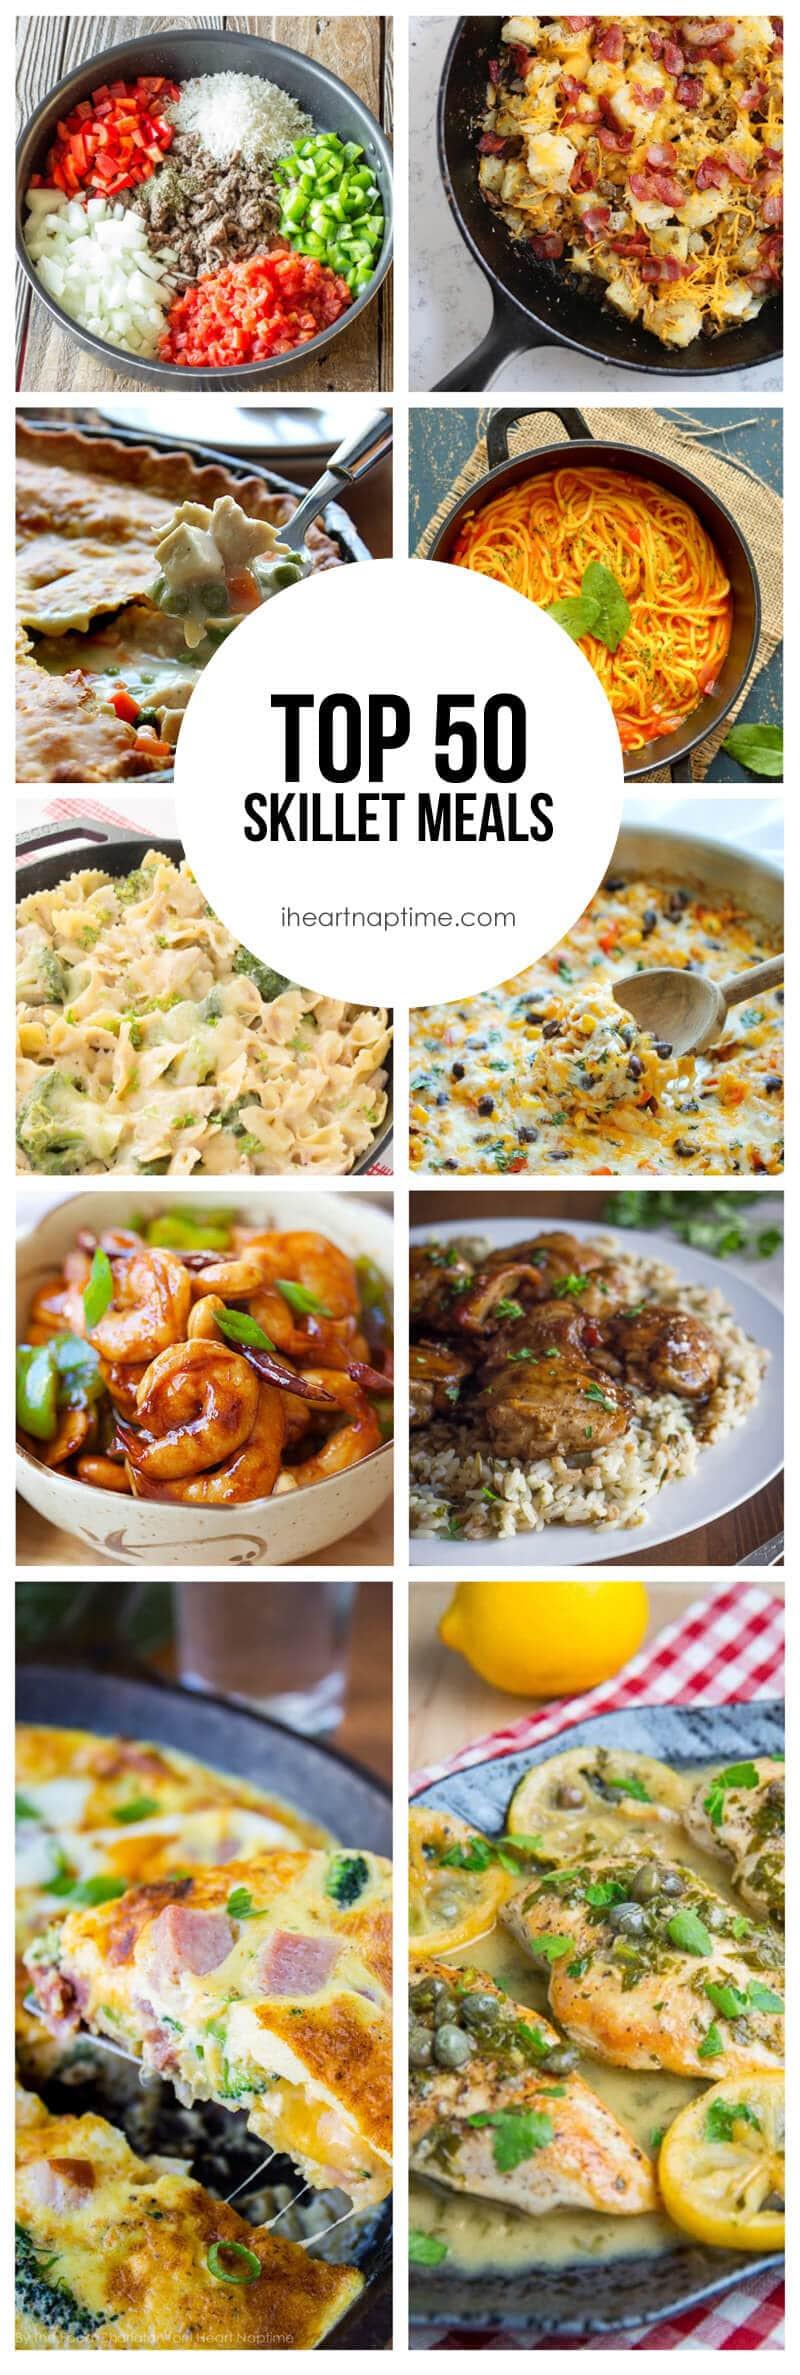 Skillet Dinners Recipes  Top 50 Skillet Meals I Heart Nap Time